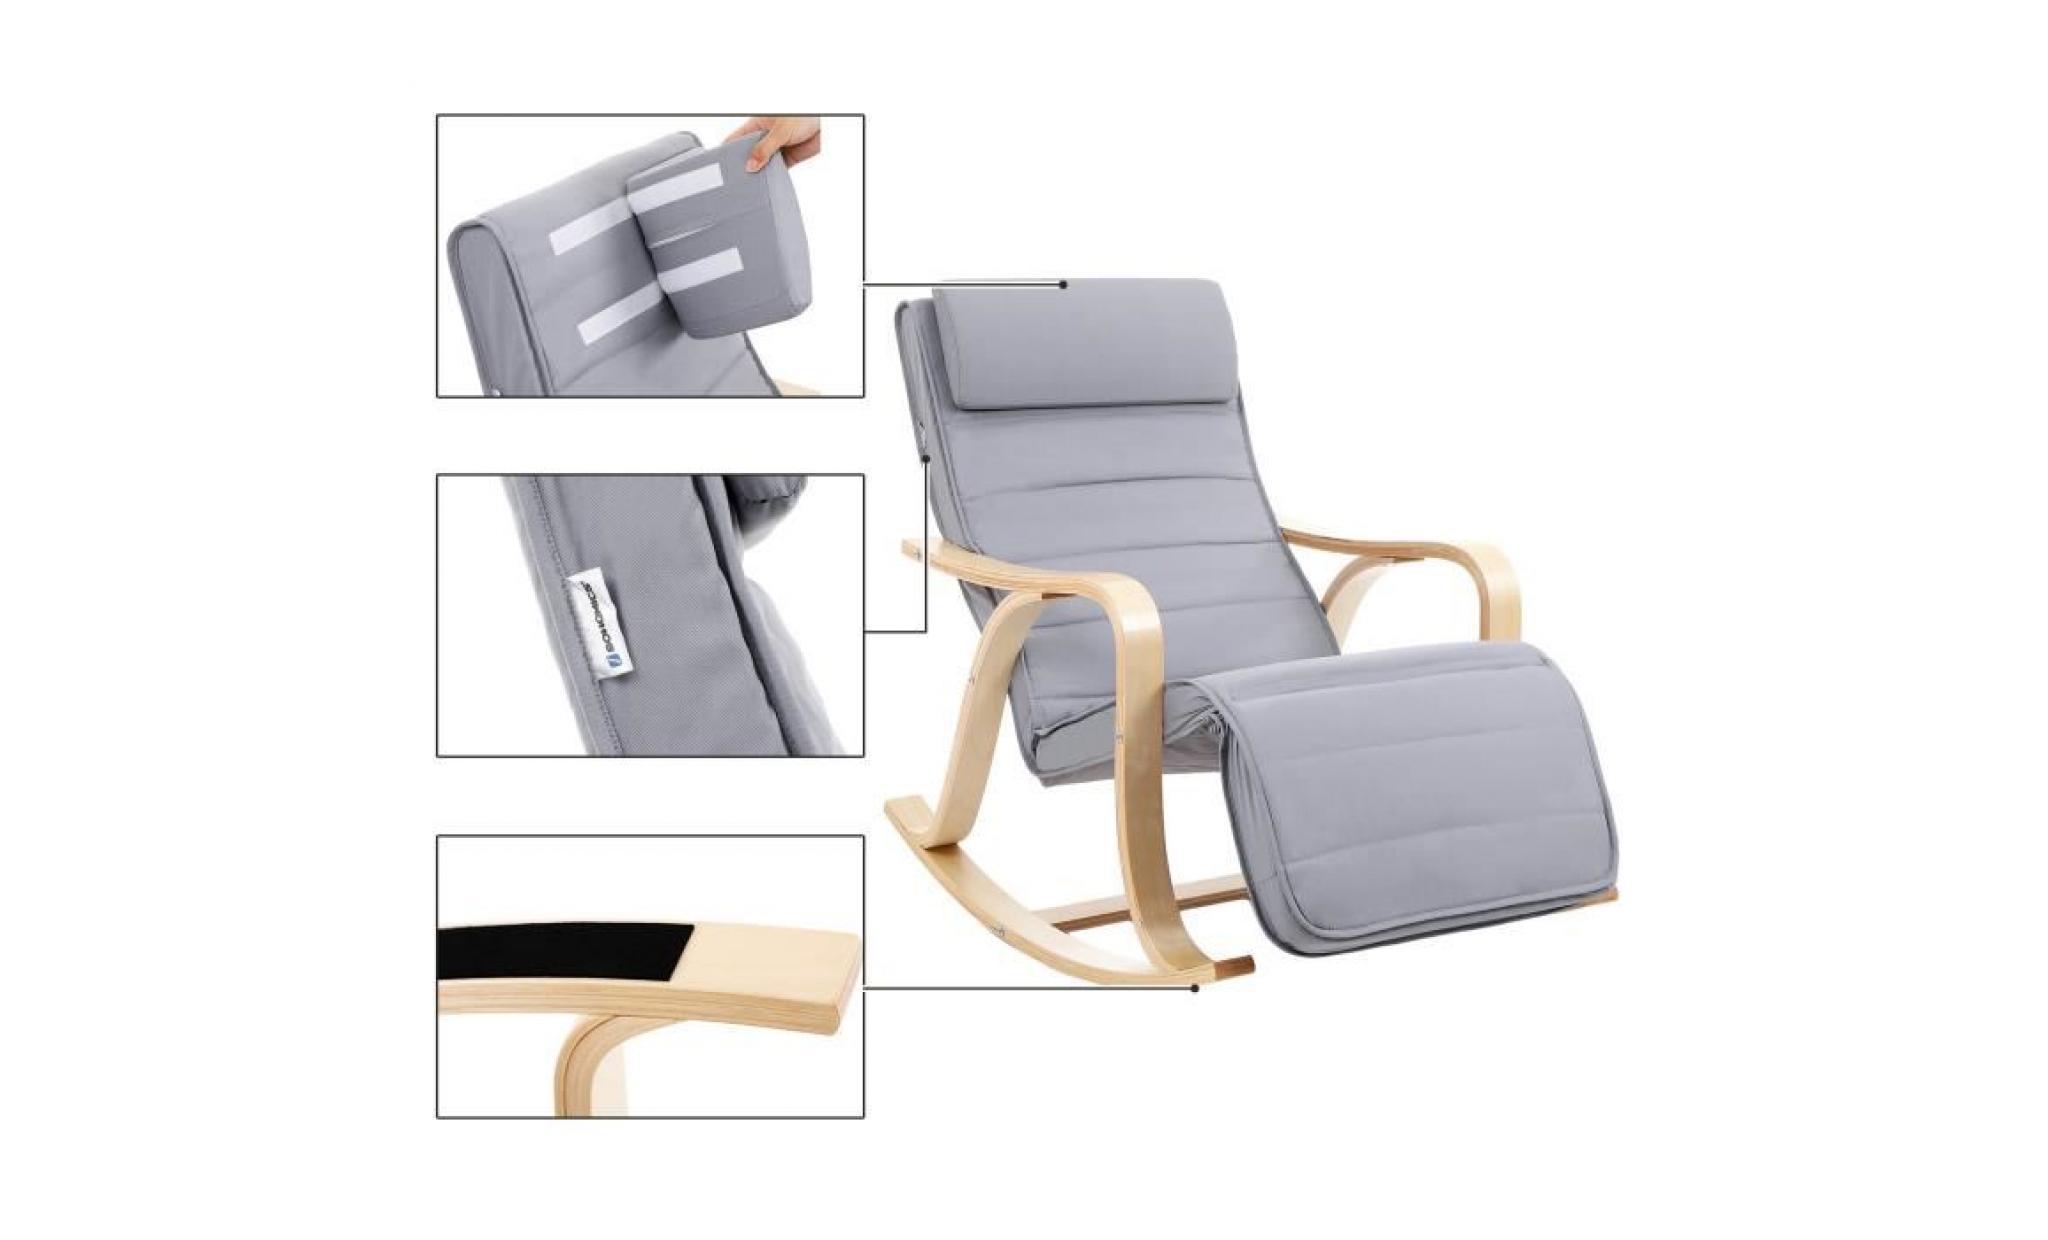 Songmics Fauteuil A Bascule Rocking Chair Revetement Tissu Avec